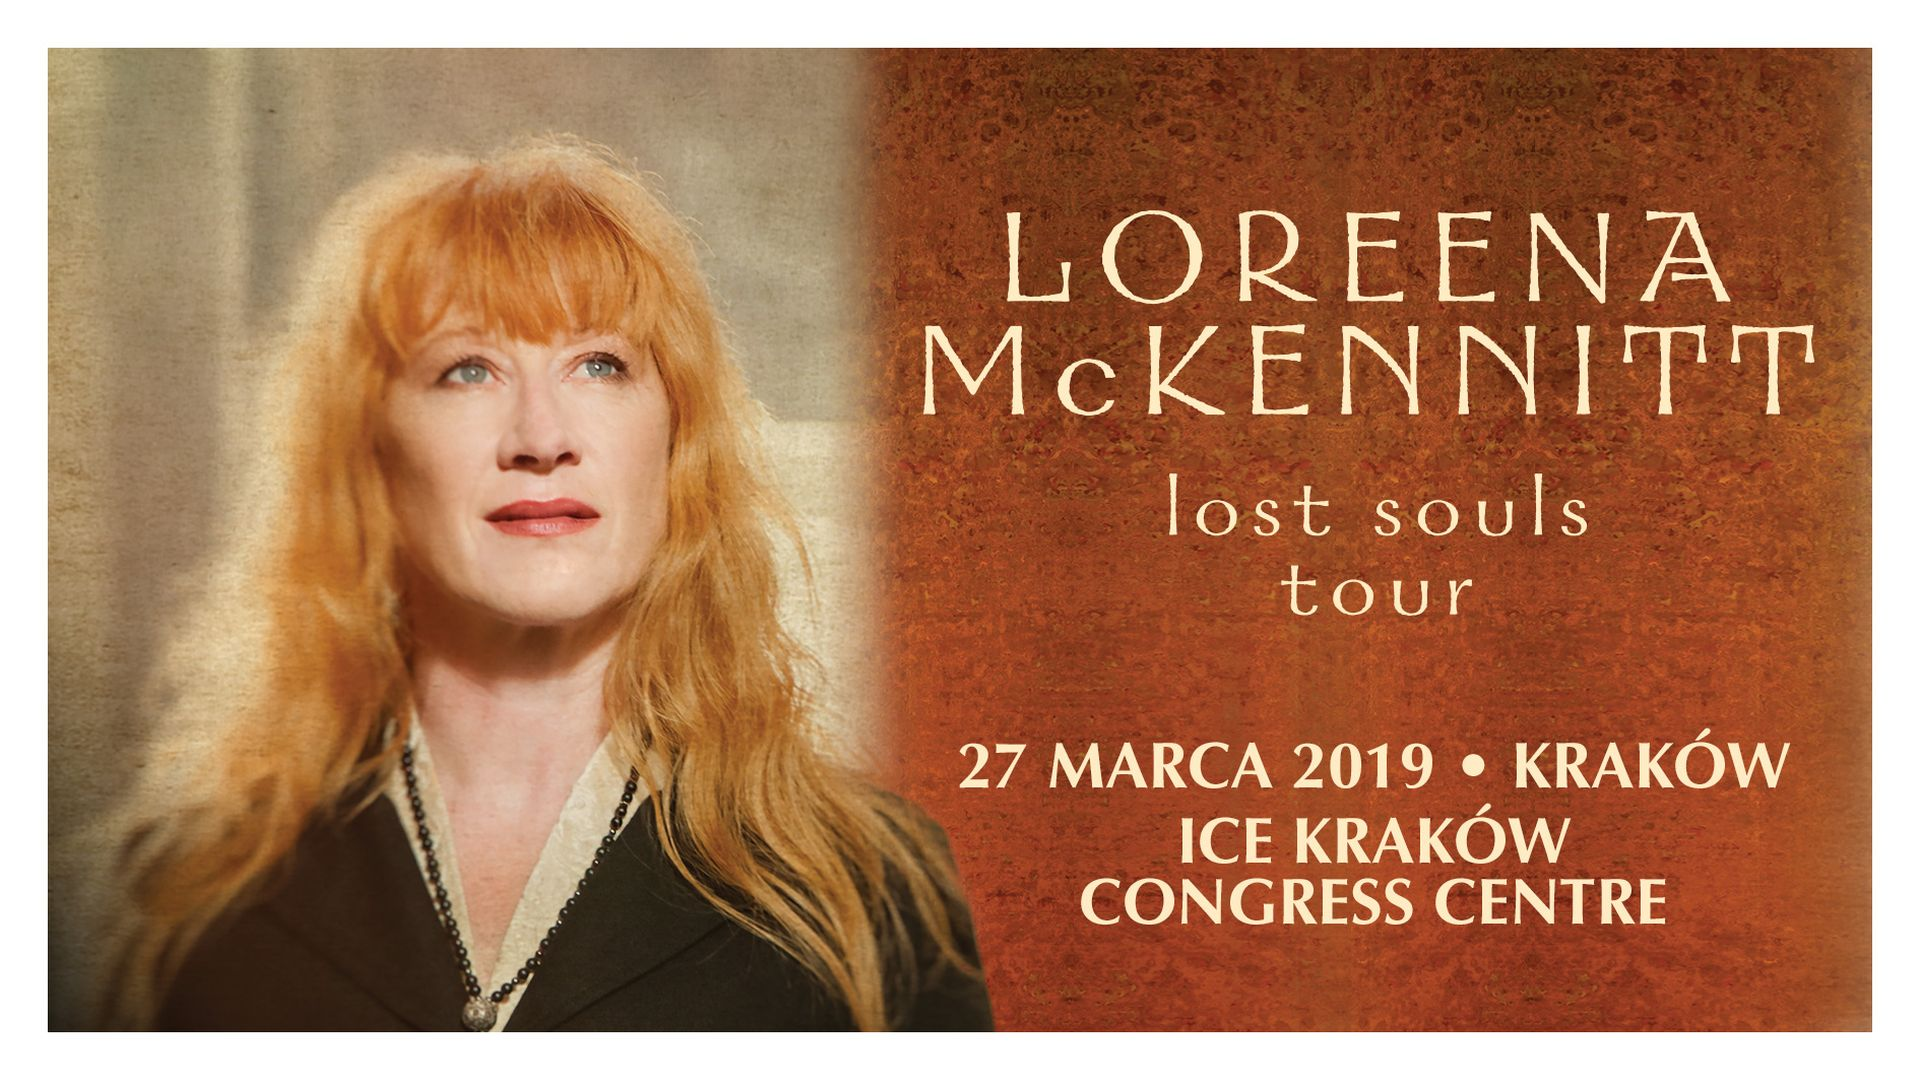 Bilety kolekcjonerskie - Loreena McKennitt